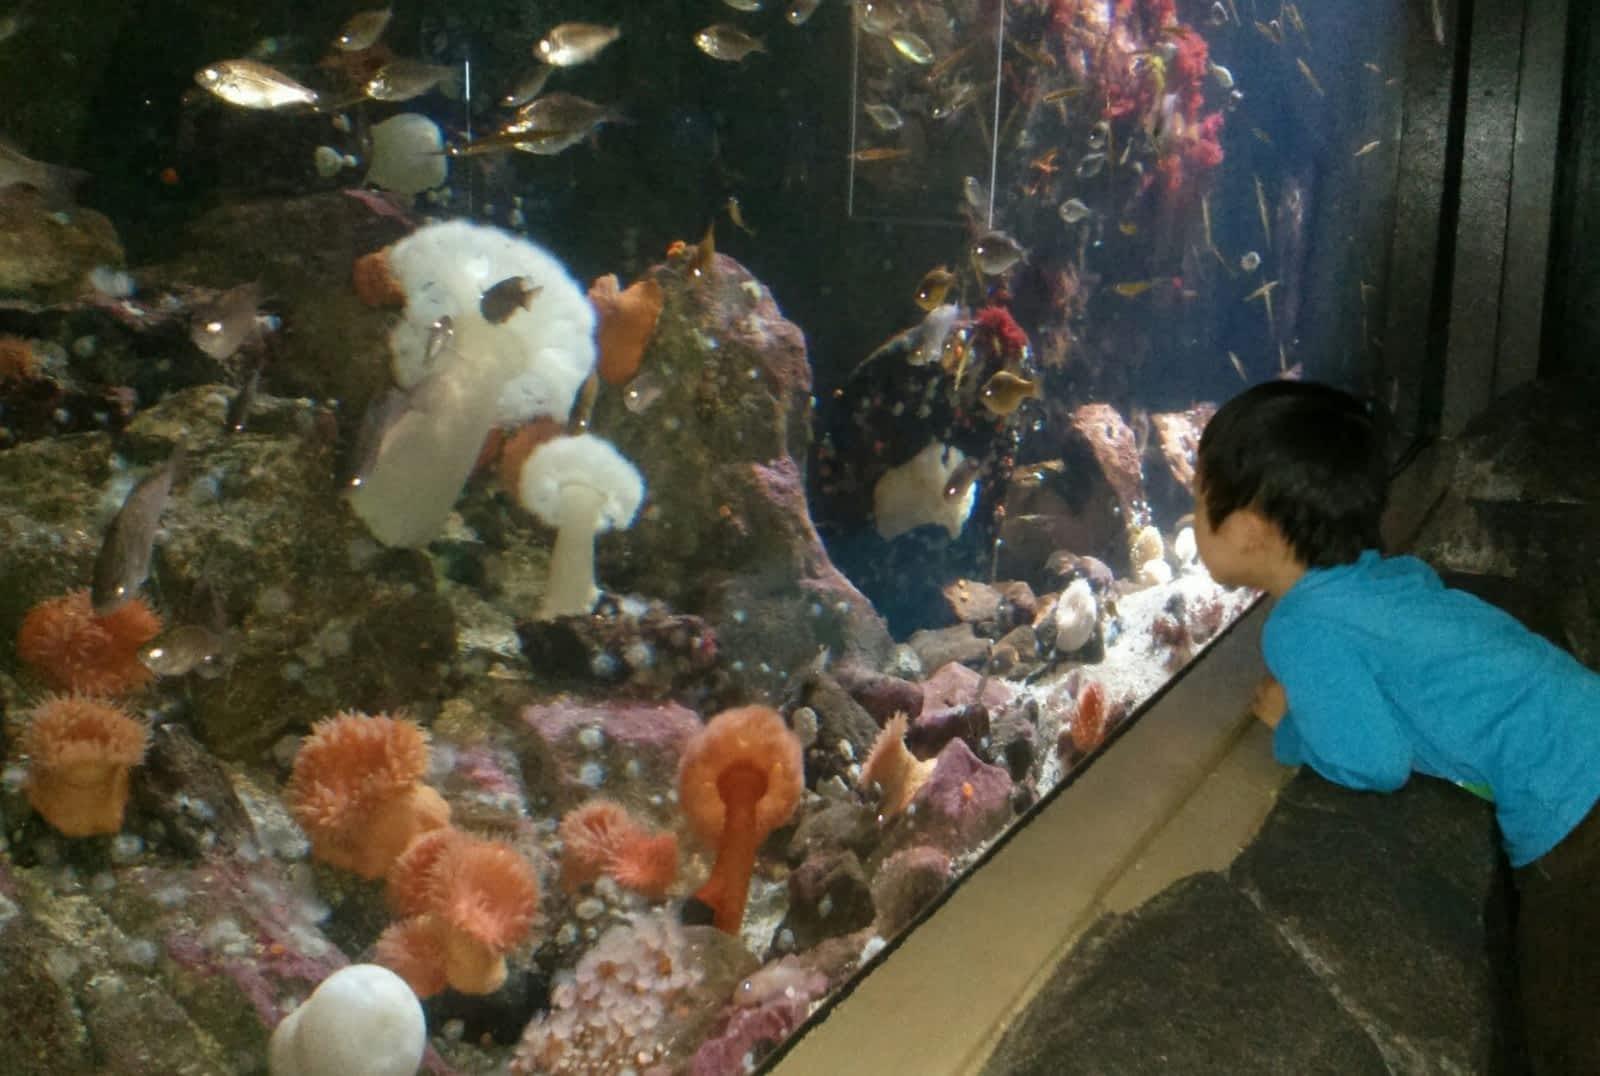 vancouver aquarium marine science centre opening hours 845 avison way vancouver bc